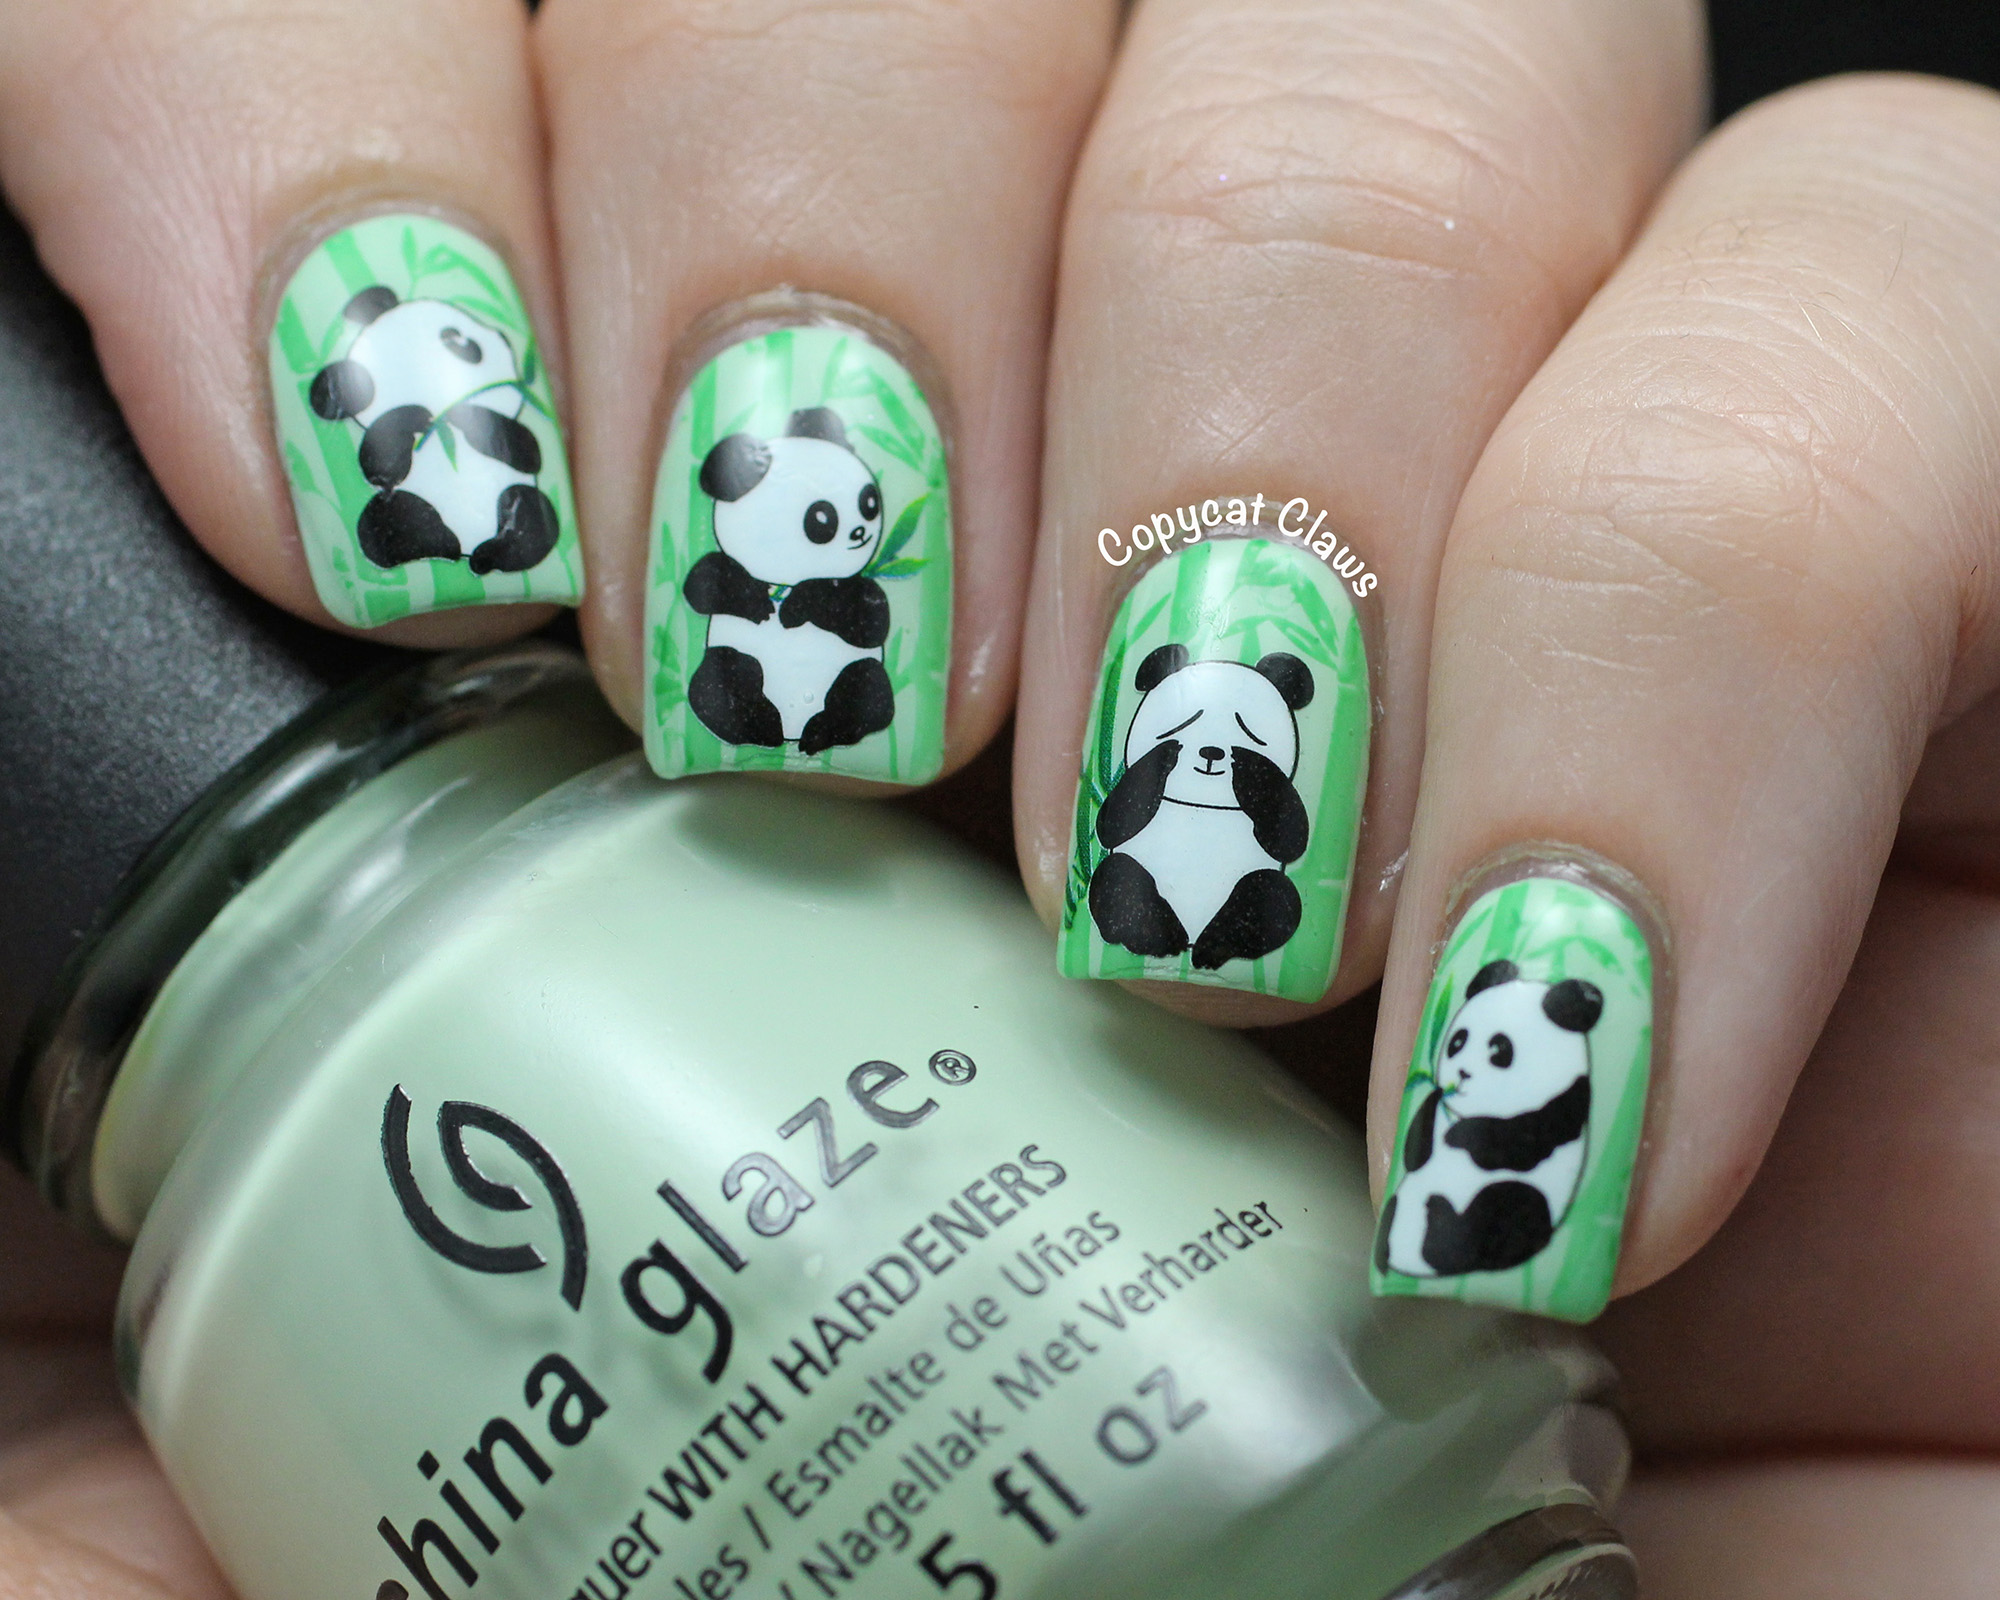 Fantástico Diseño De Uñas Oso Panda Friso - Ideas Para Pintar Uñas ...